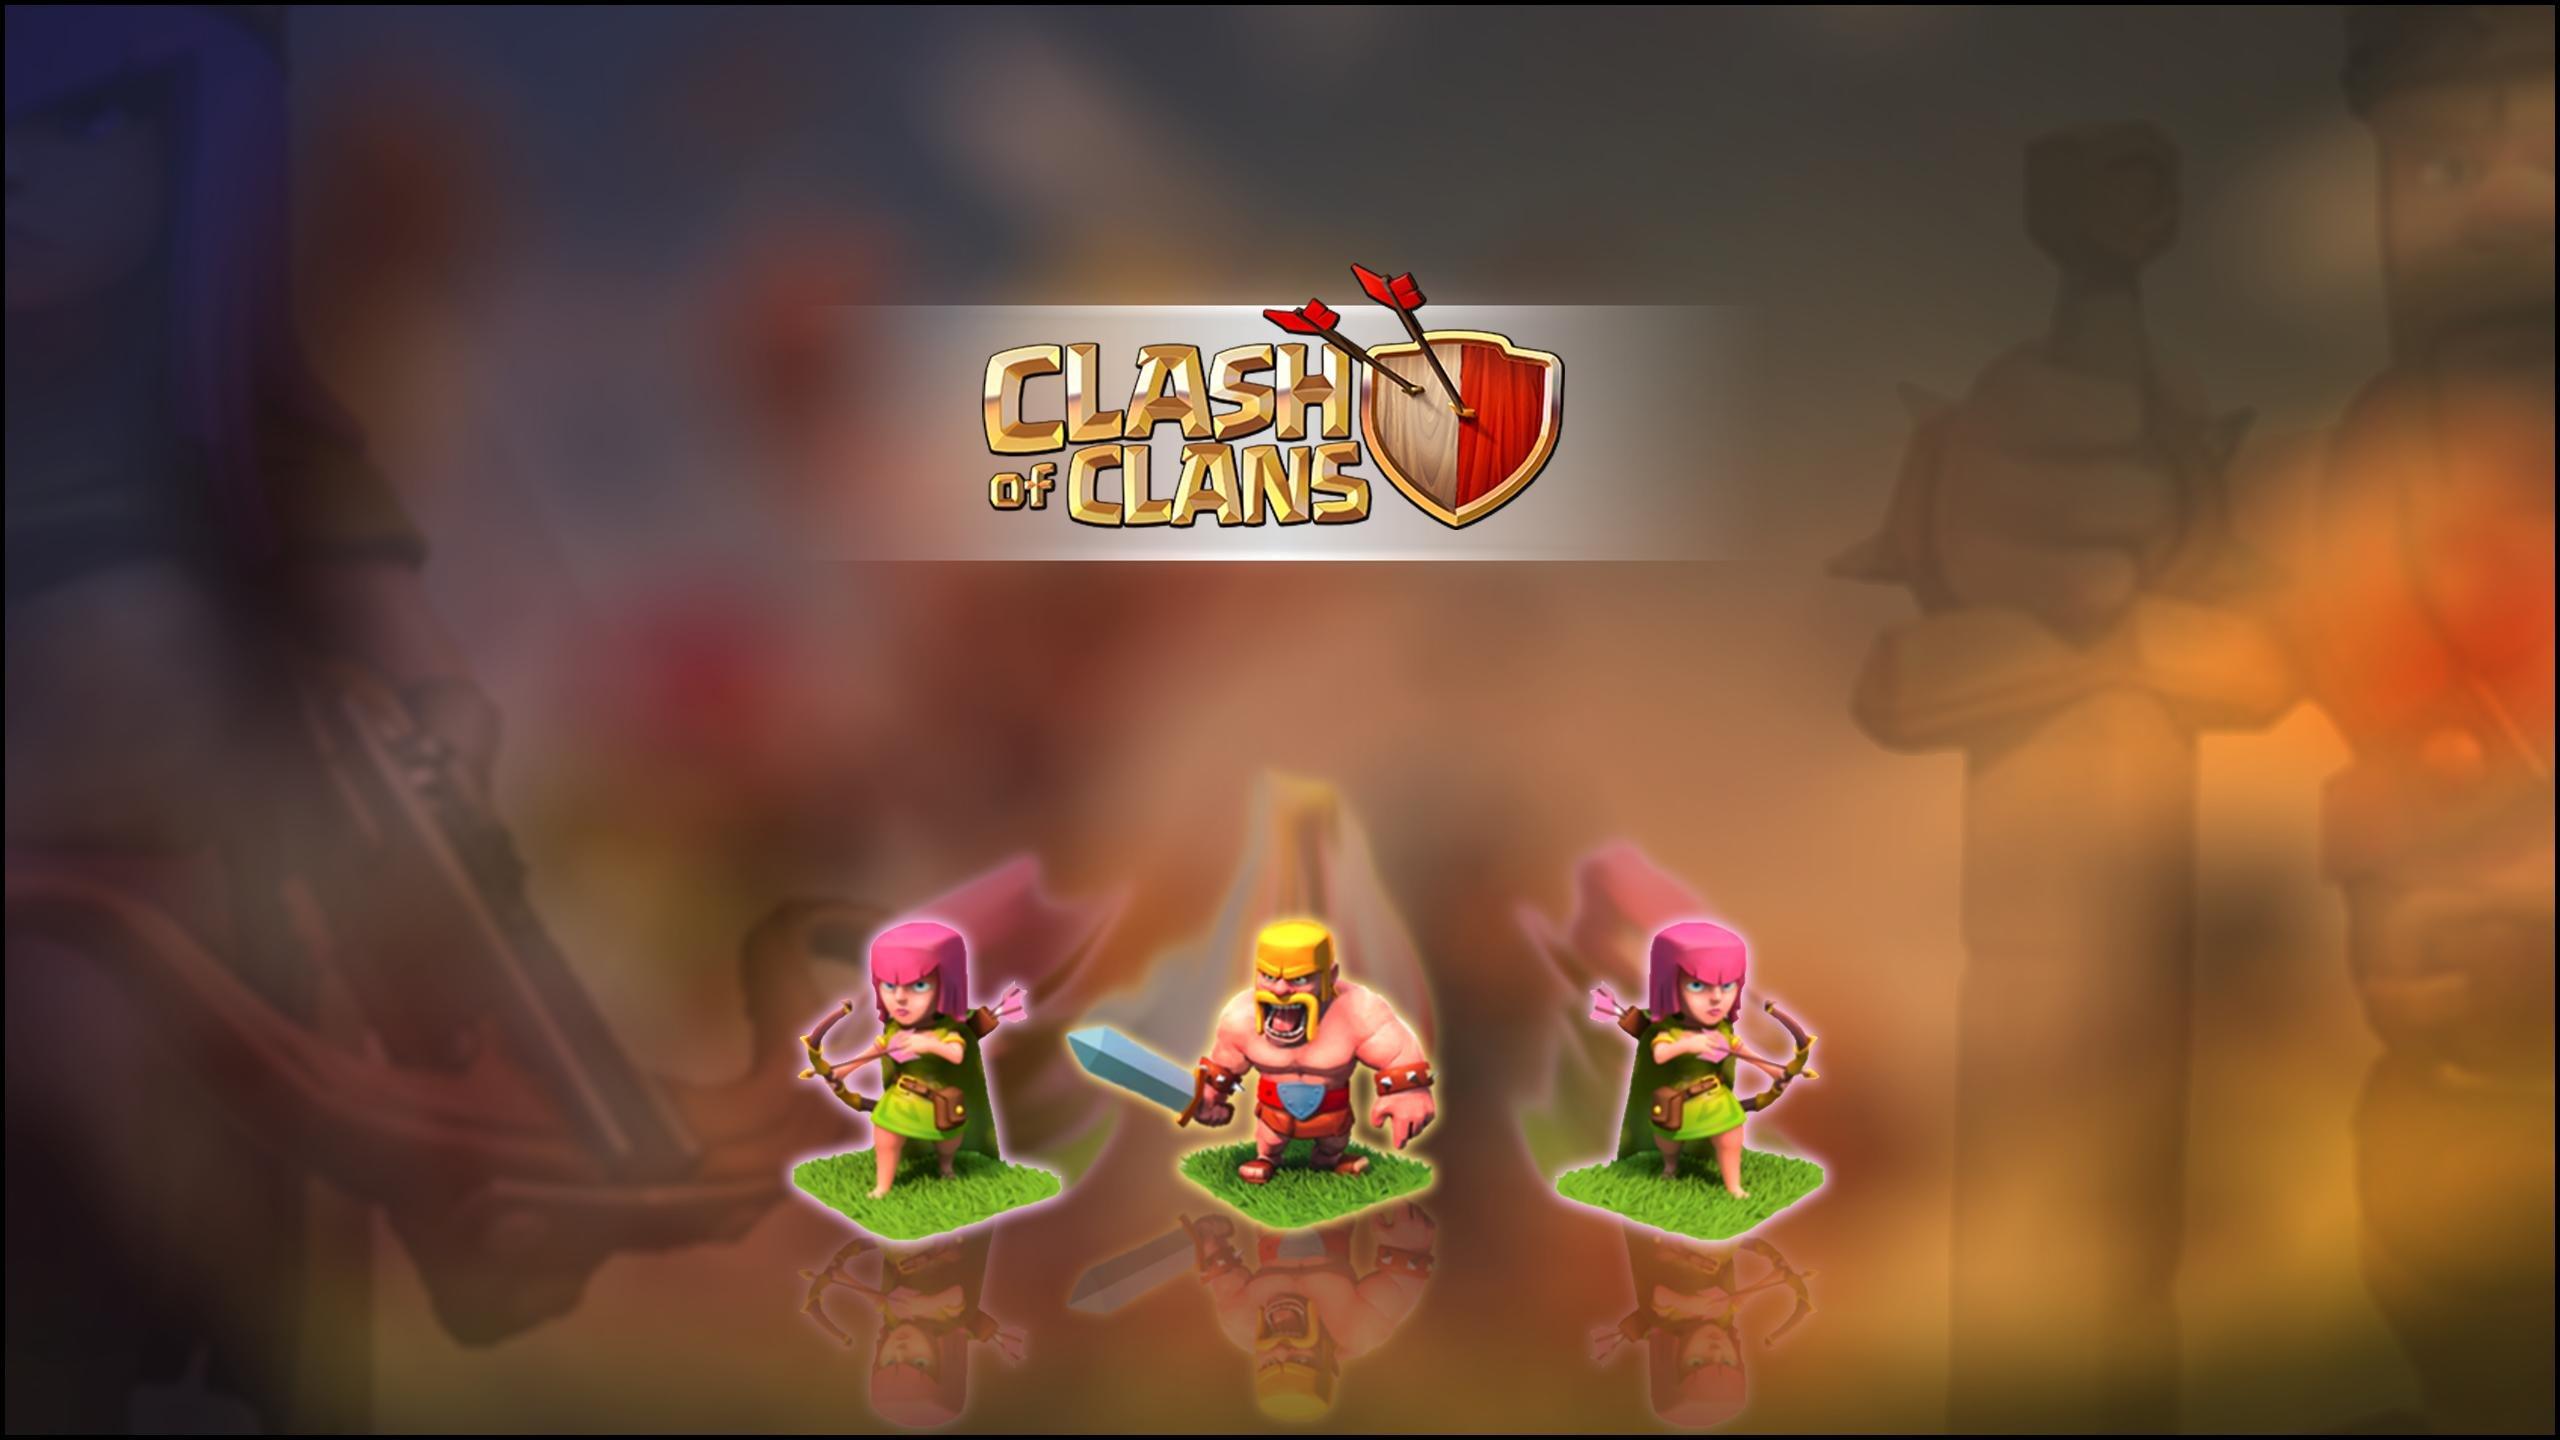 Clash of Clans Archer Barbarian Wallpaper 2560x1440